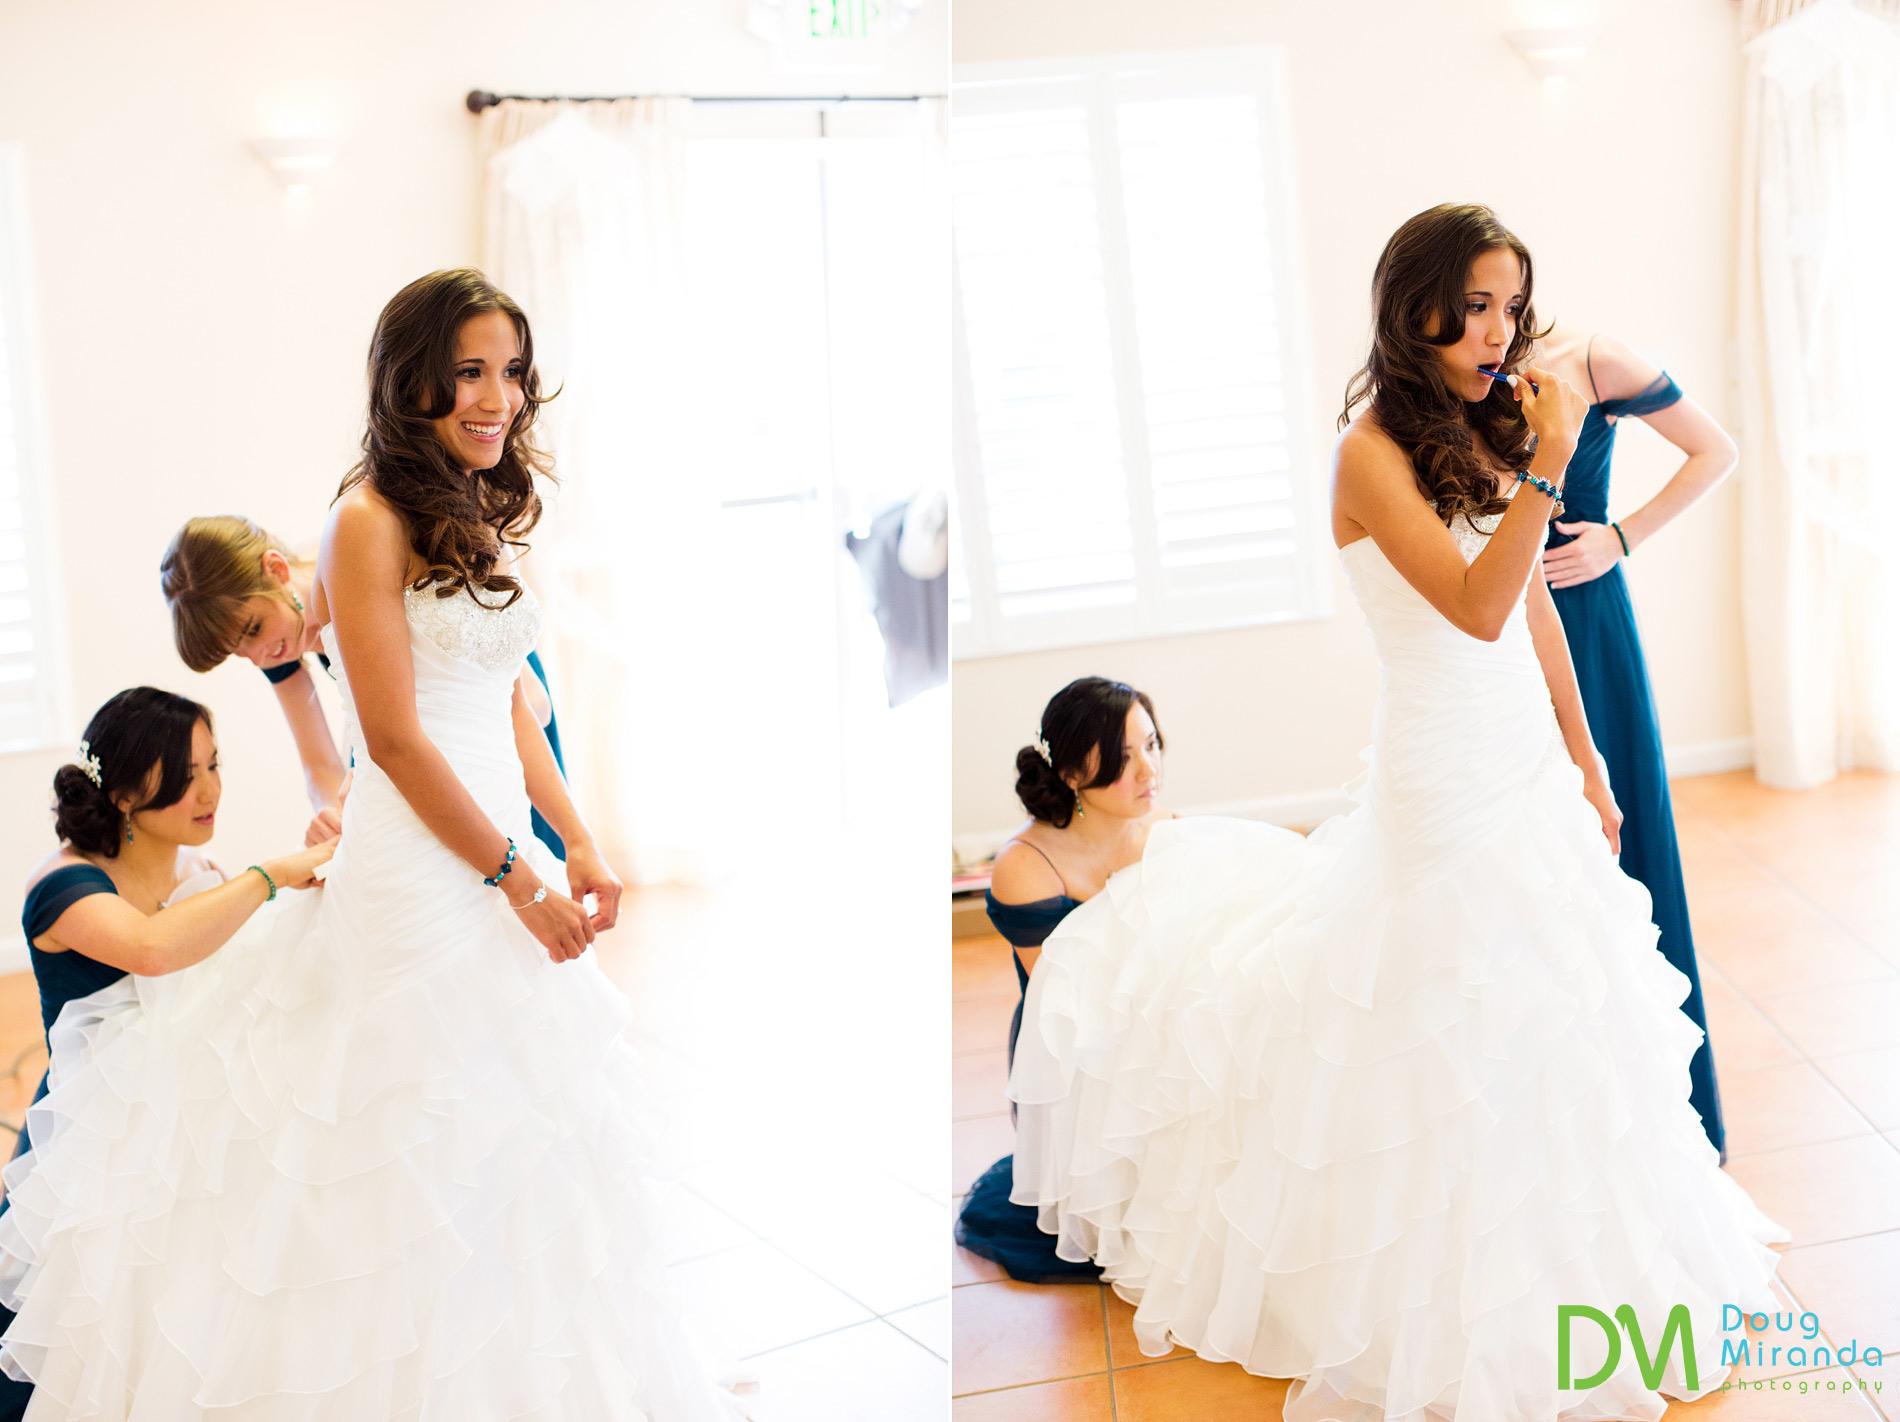 Rosie getting ready for her geyserville inn wedding ceremony